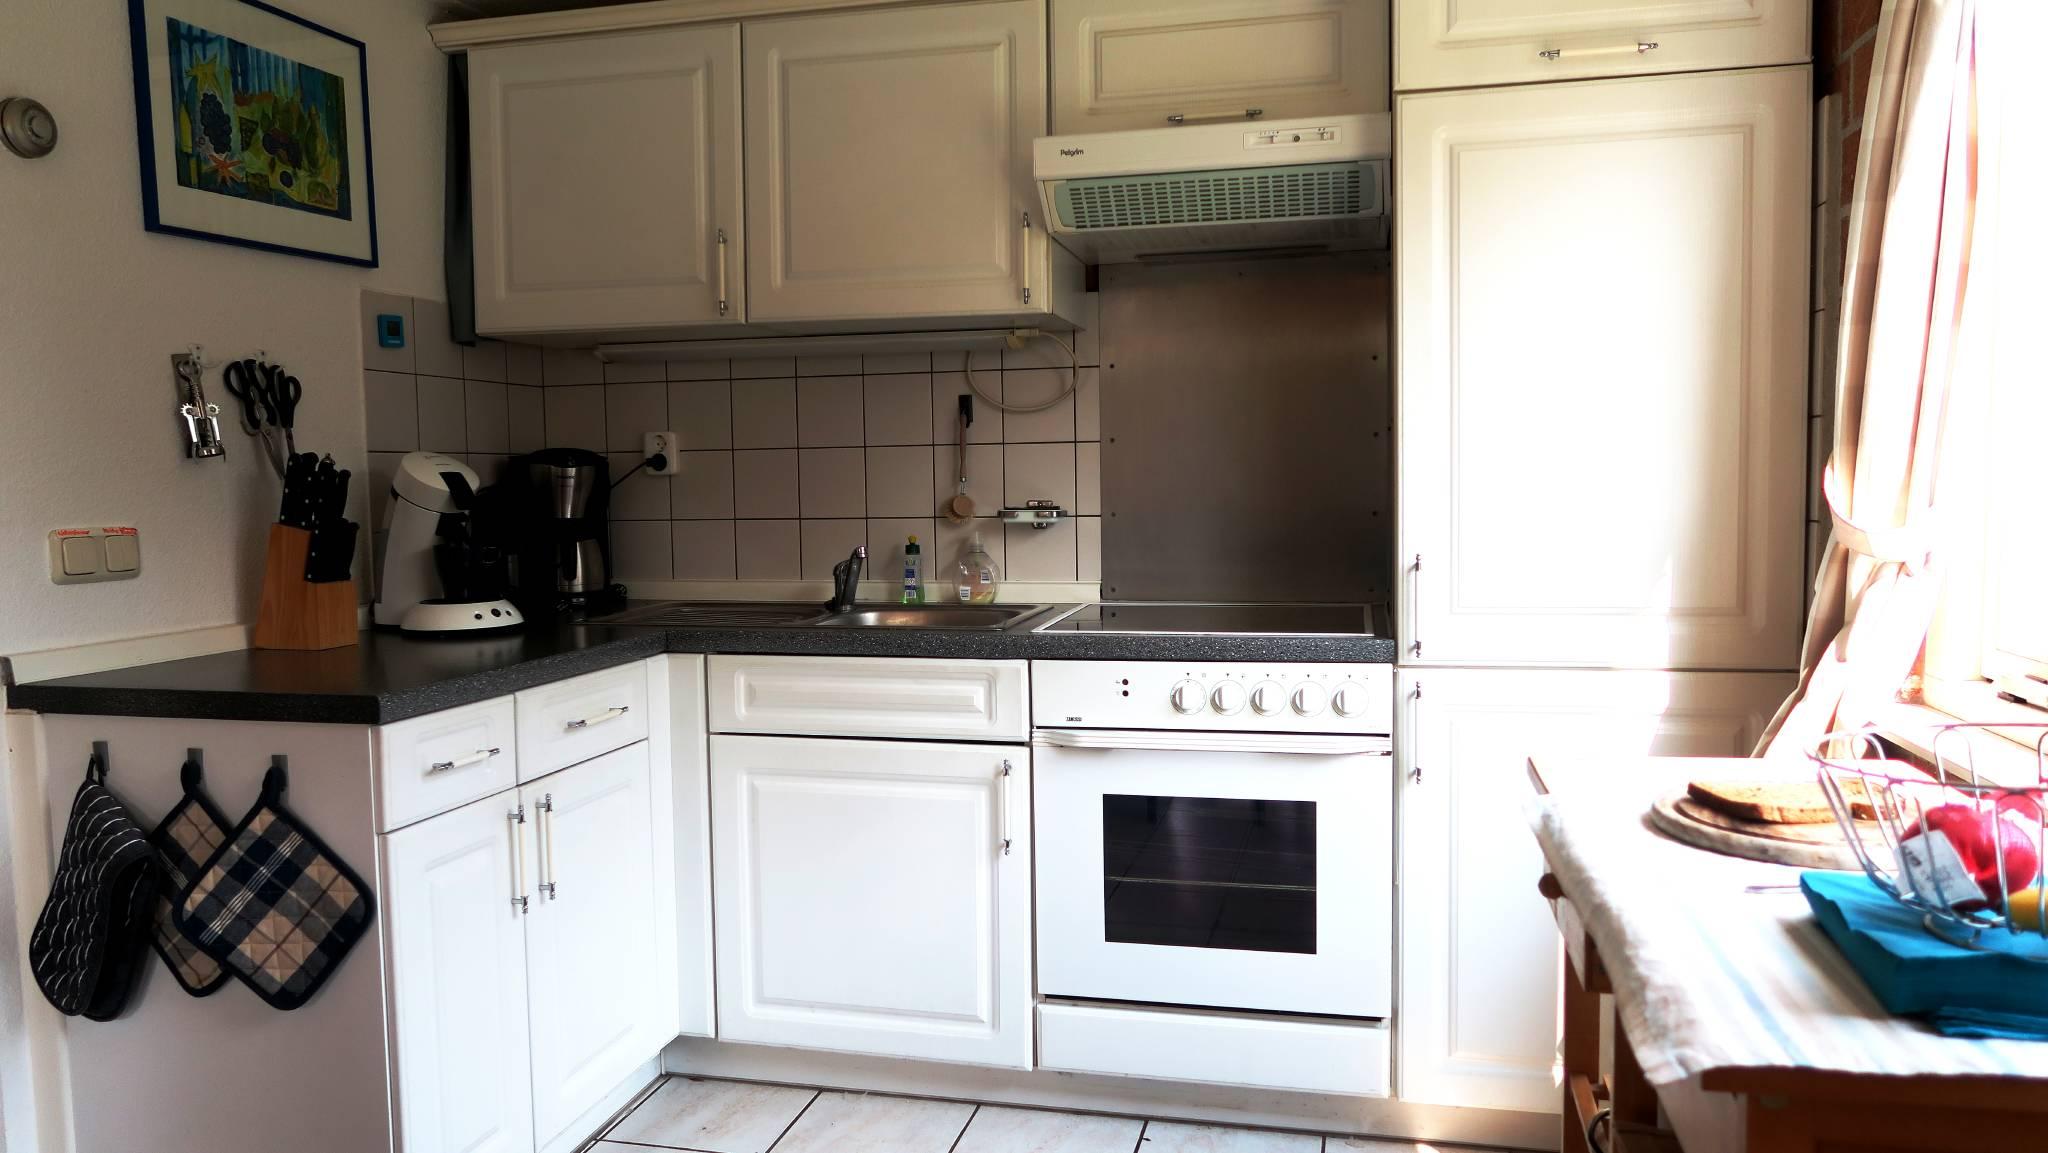 Ferienhaus Egmond-Duyncroft in Egmond aan de Hoef Noord-Holland